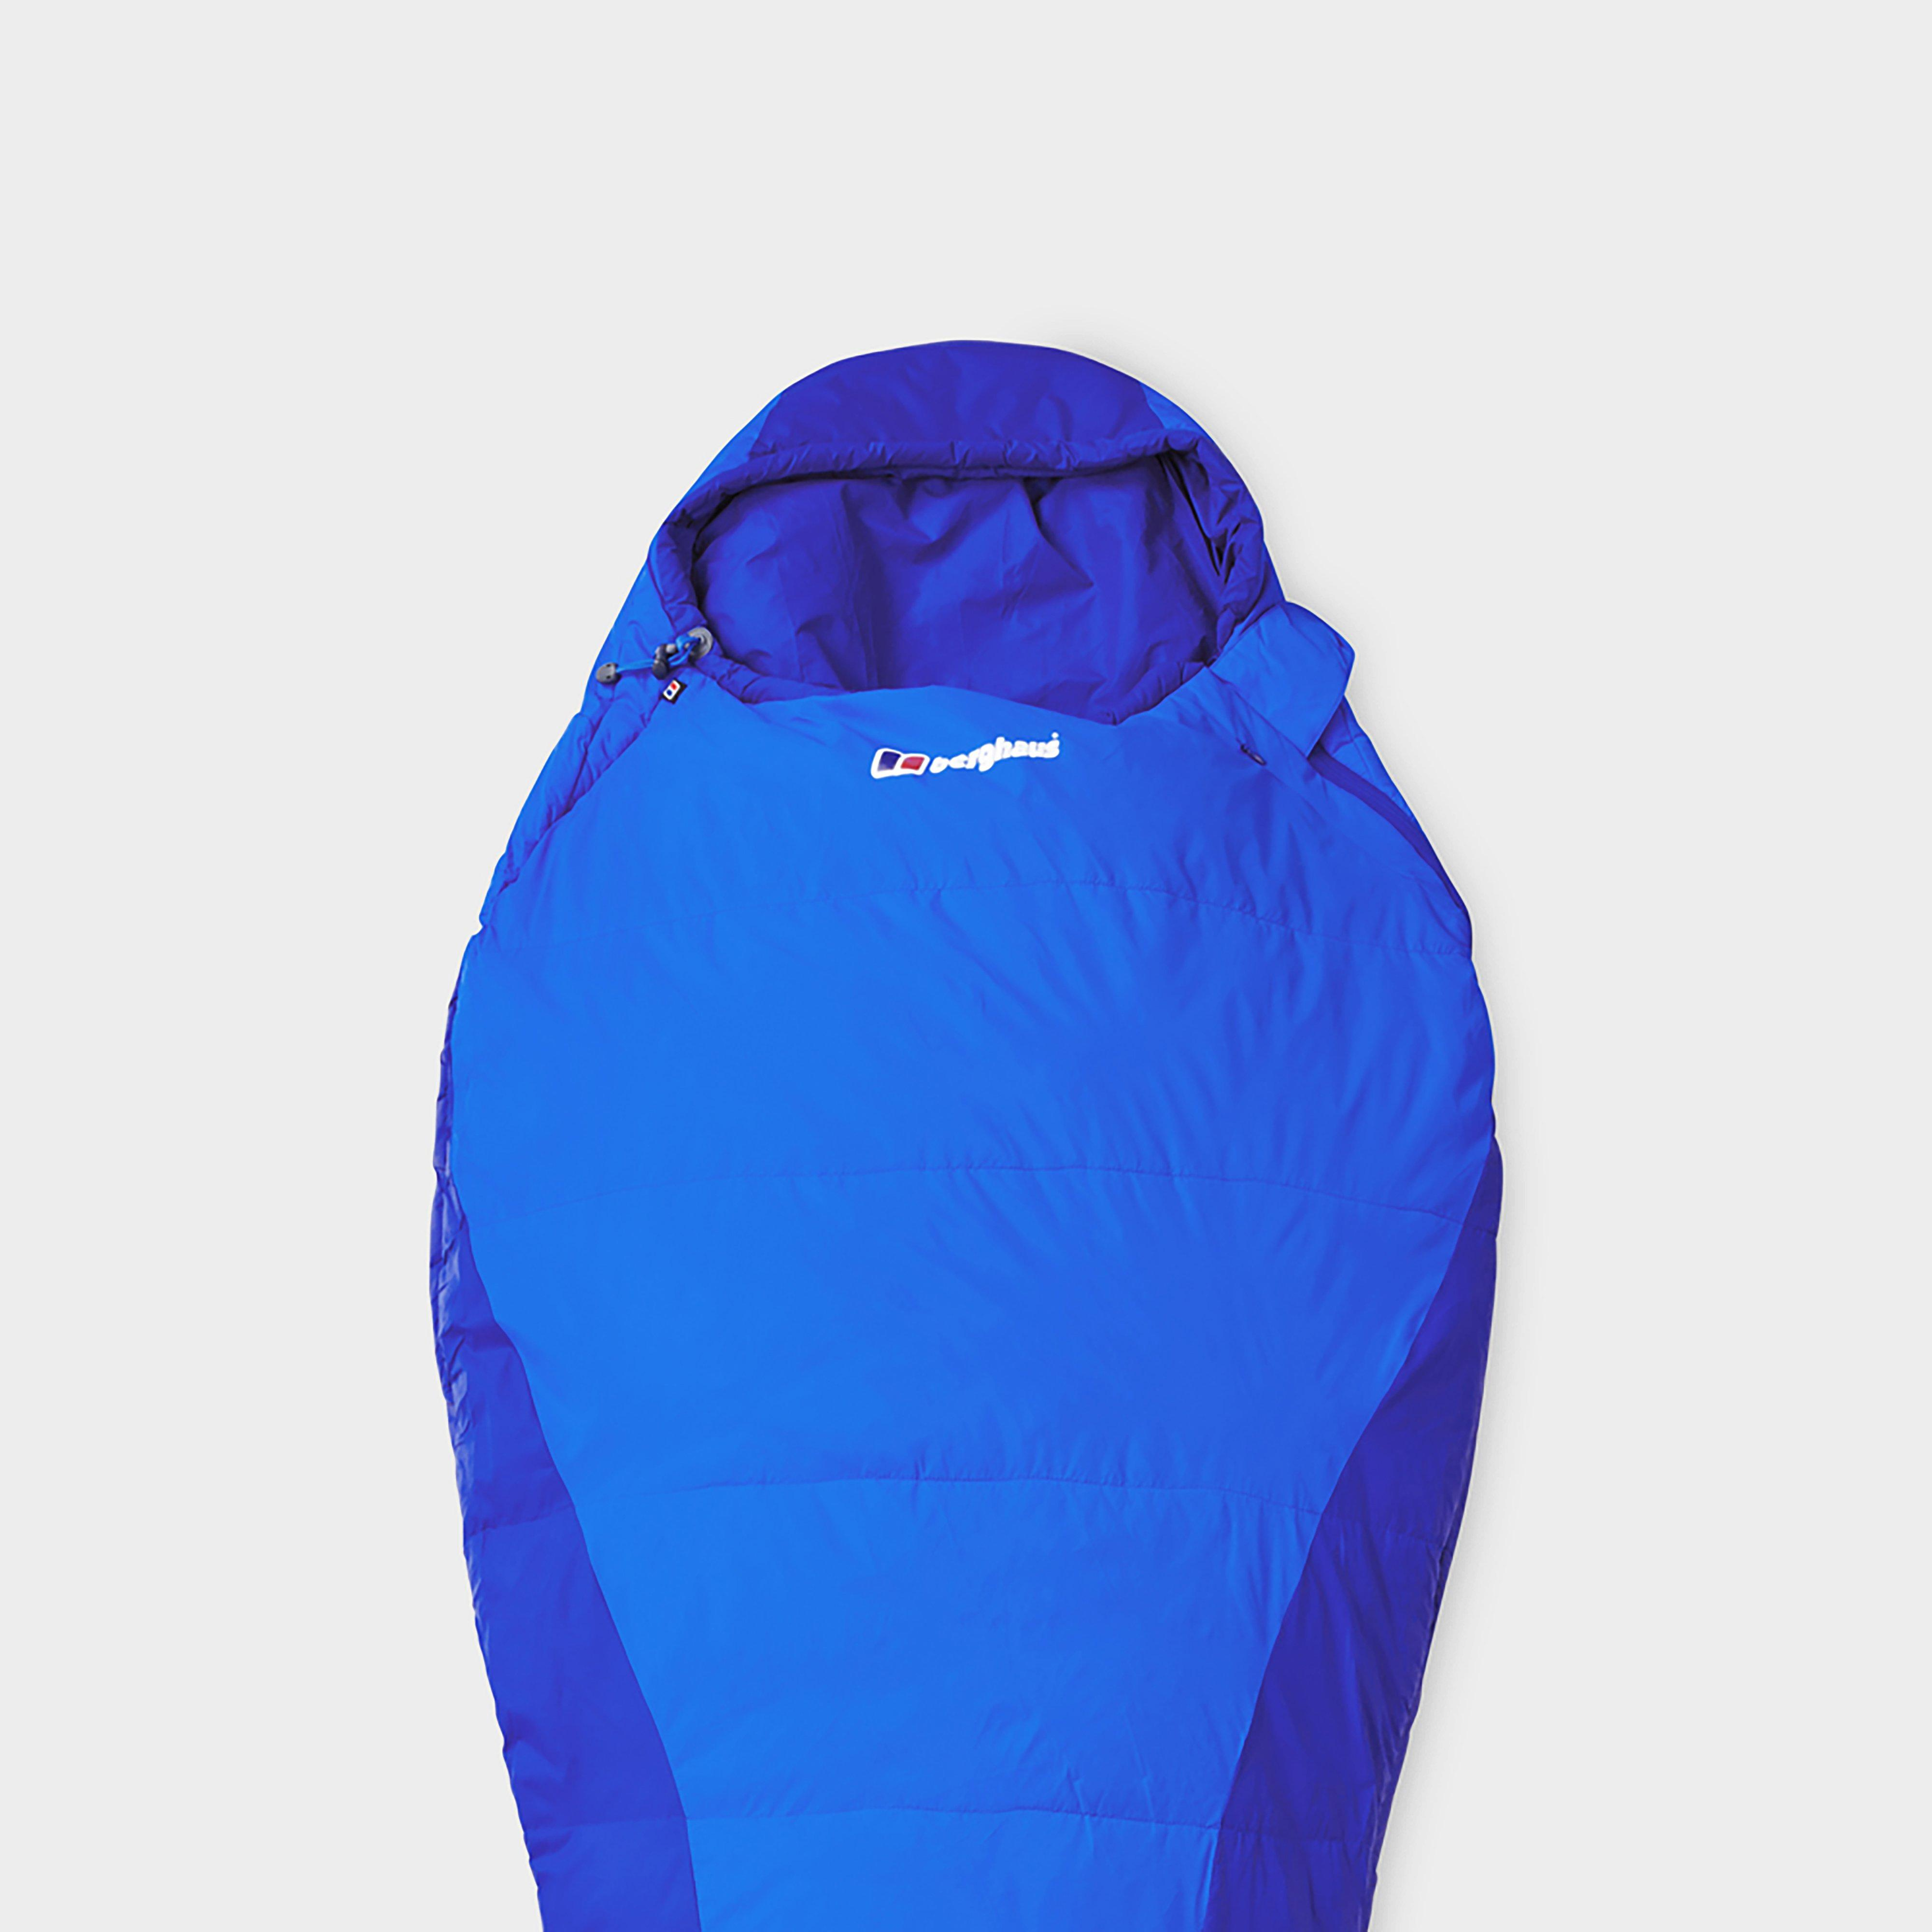 Berghaus Intrepid 700 Sleeping Bag - Blue  Blue